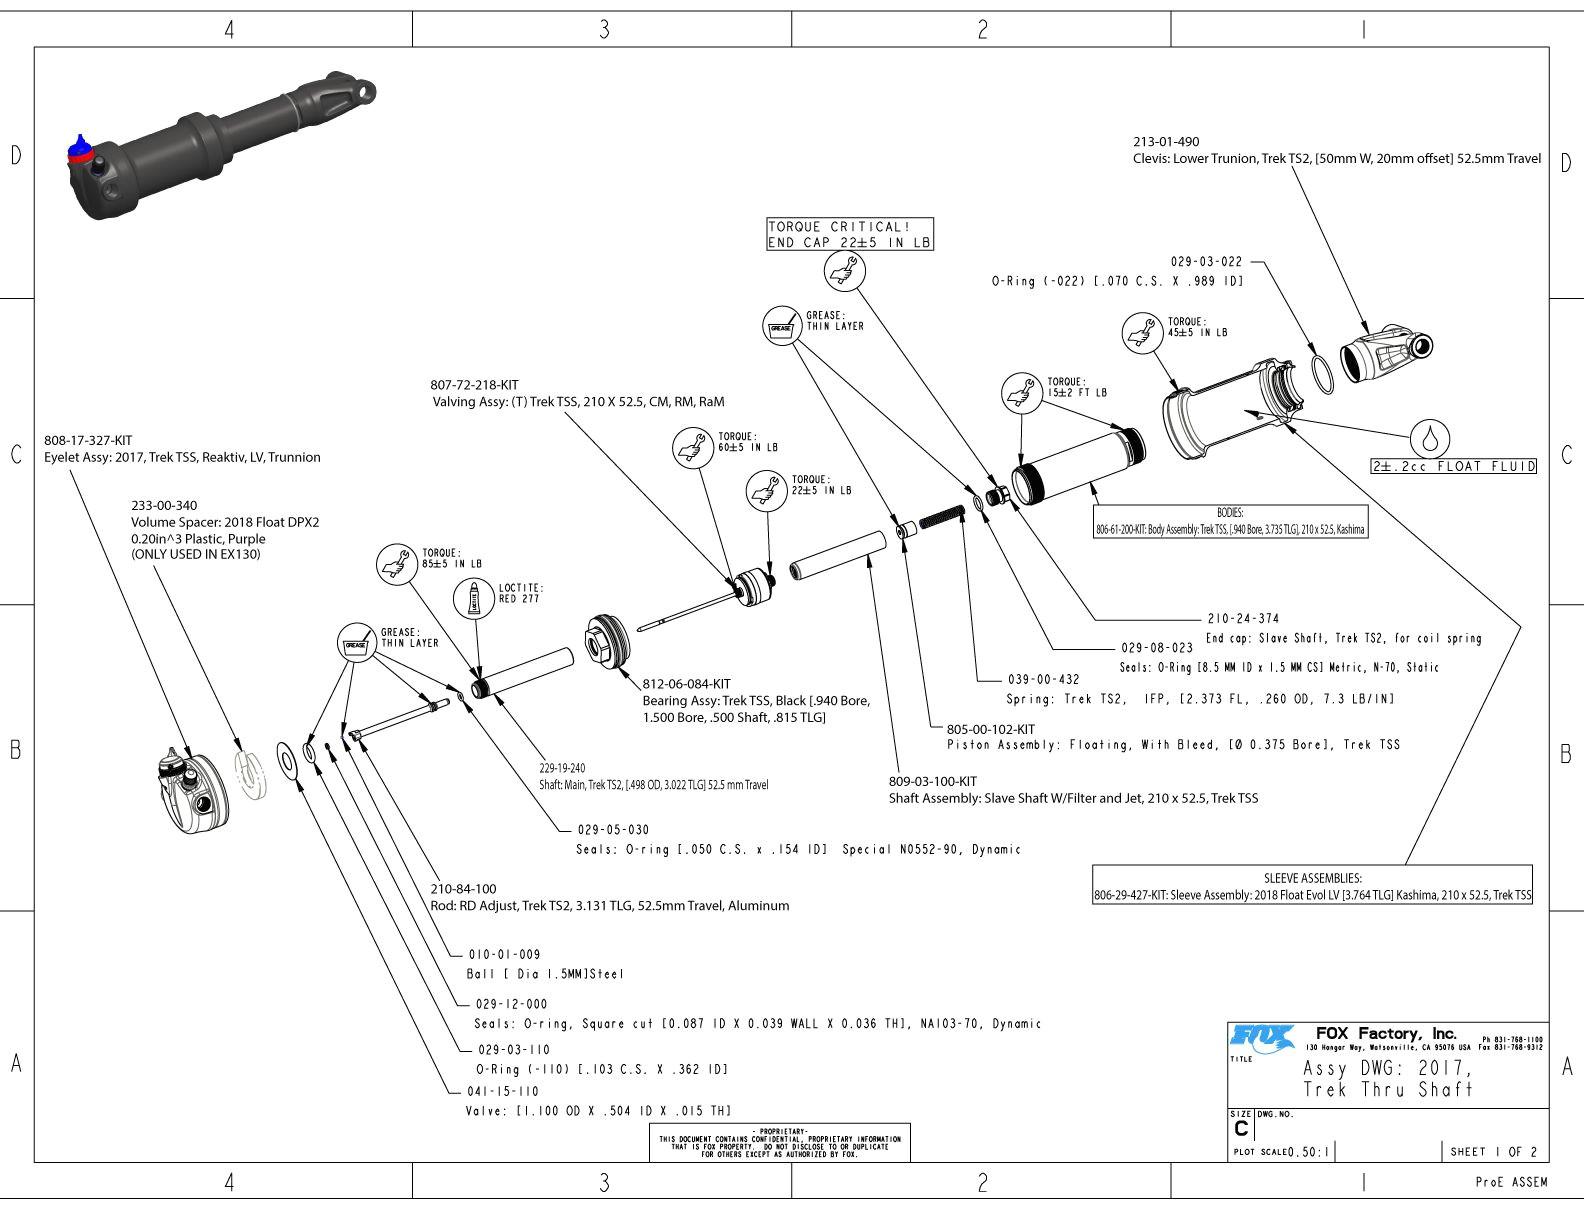 assembly drawing trek thru shaft